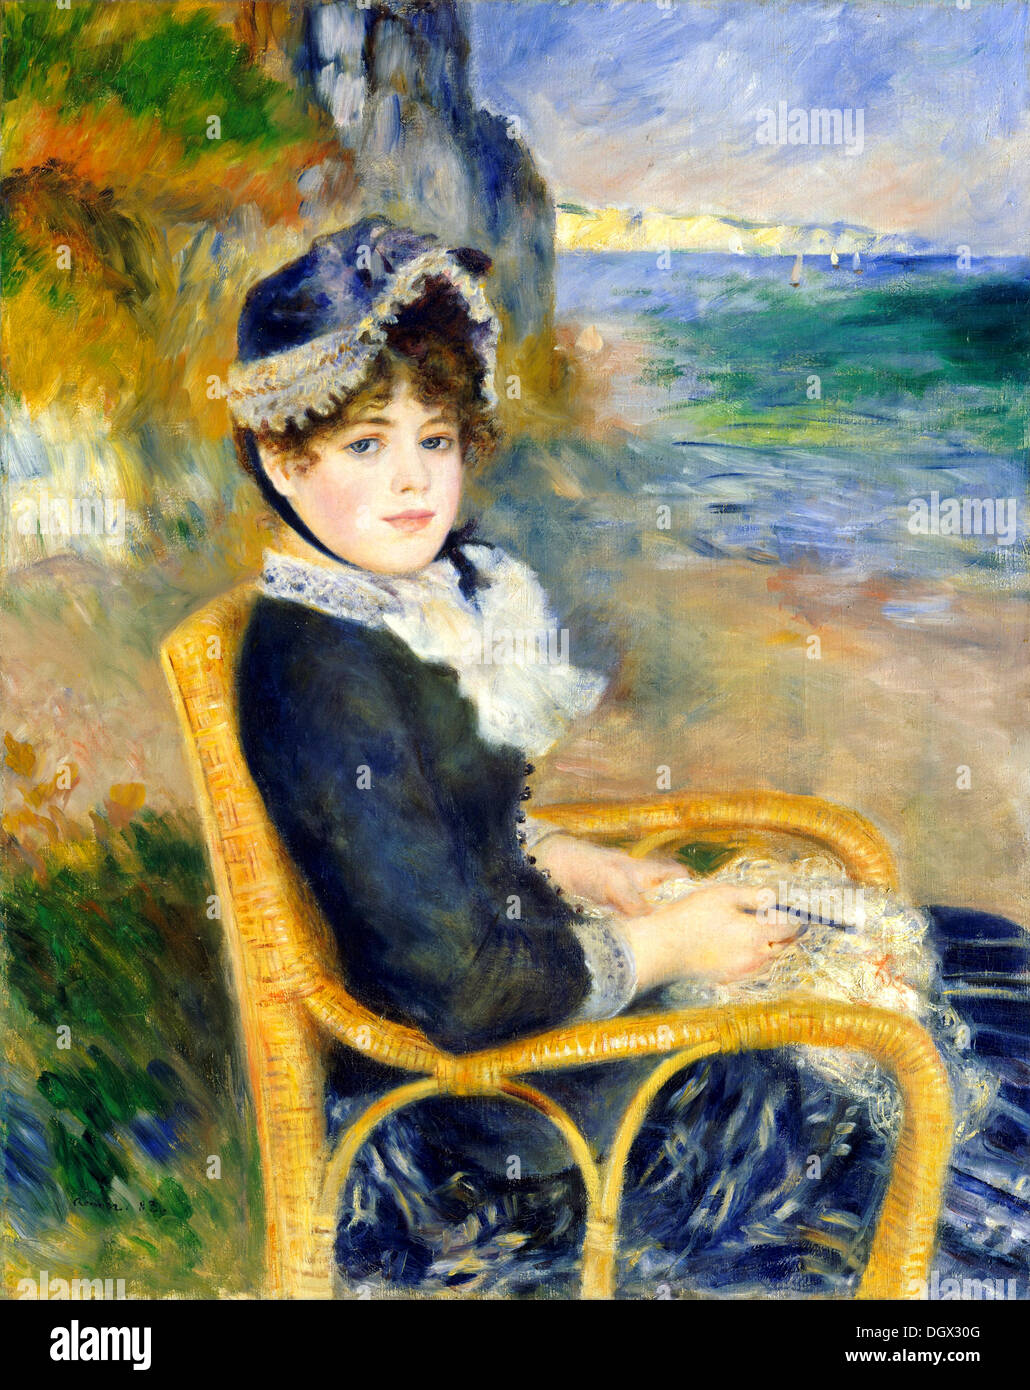 By the Seashore - by Pierre-Auguste Renoir, 1883 - Stock Image